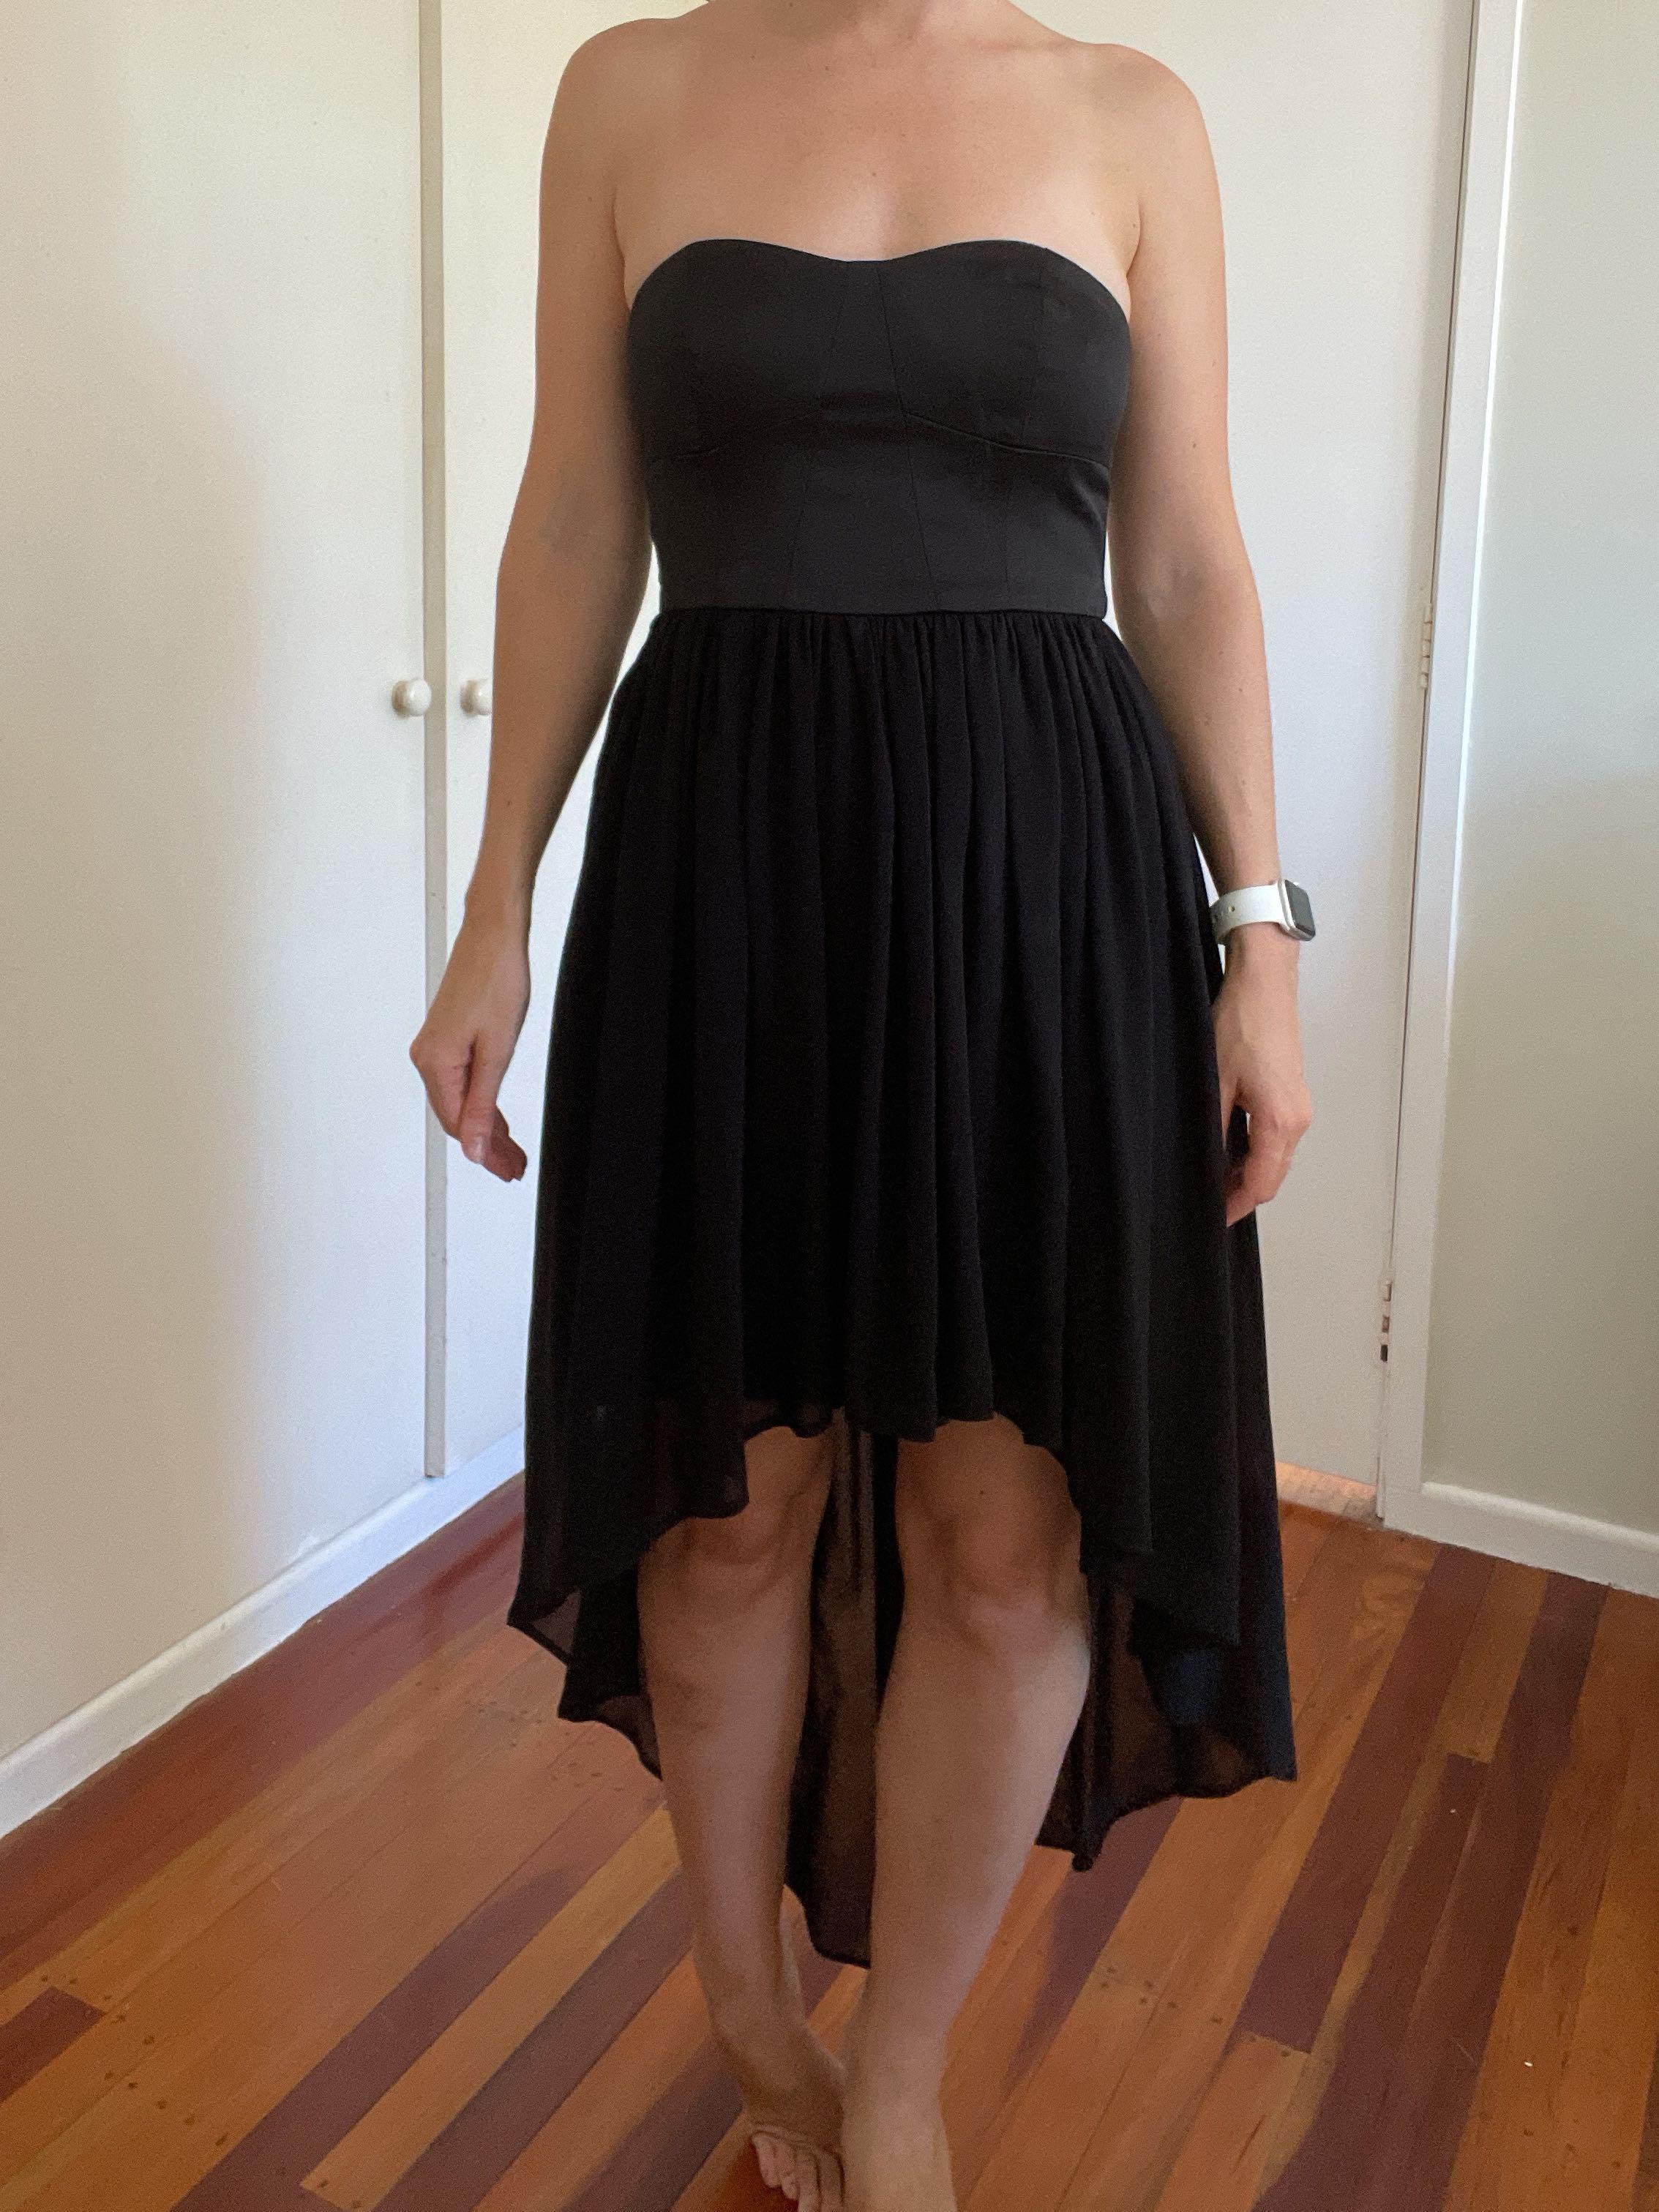 Strapless Black Dress, Size 8